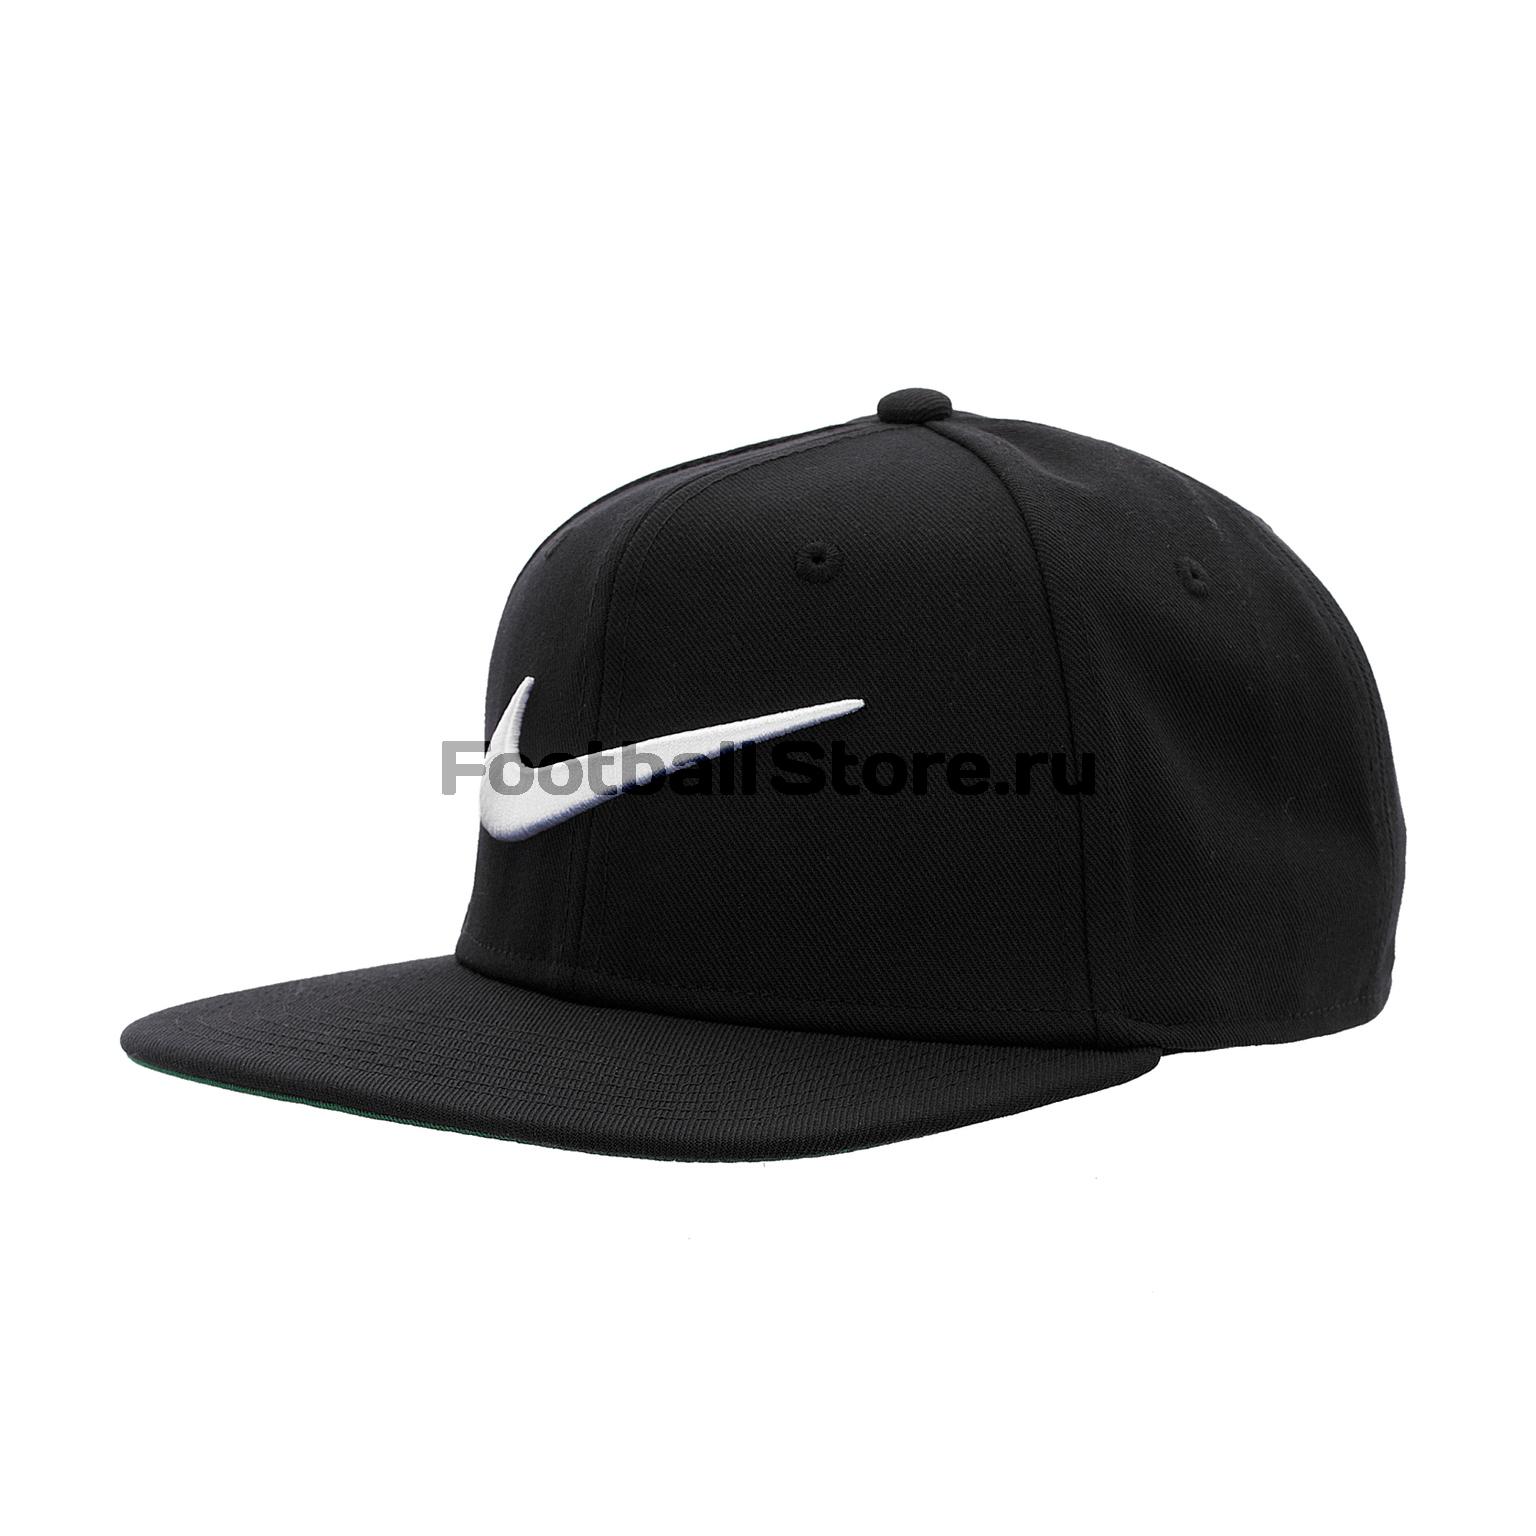 c299ce0a Бейсболка Nike Swoosh Pro Classic 639534-011